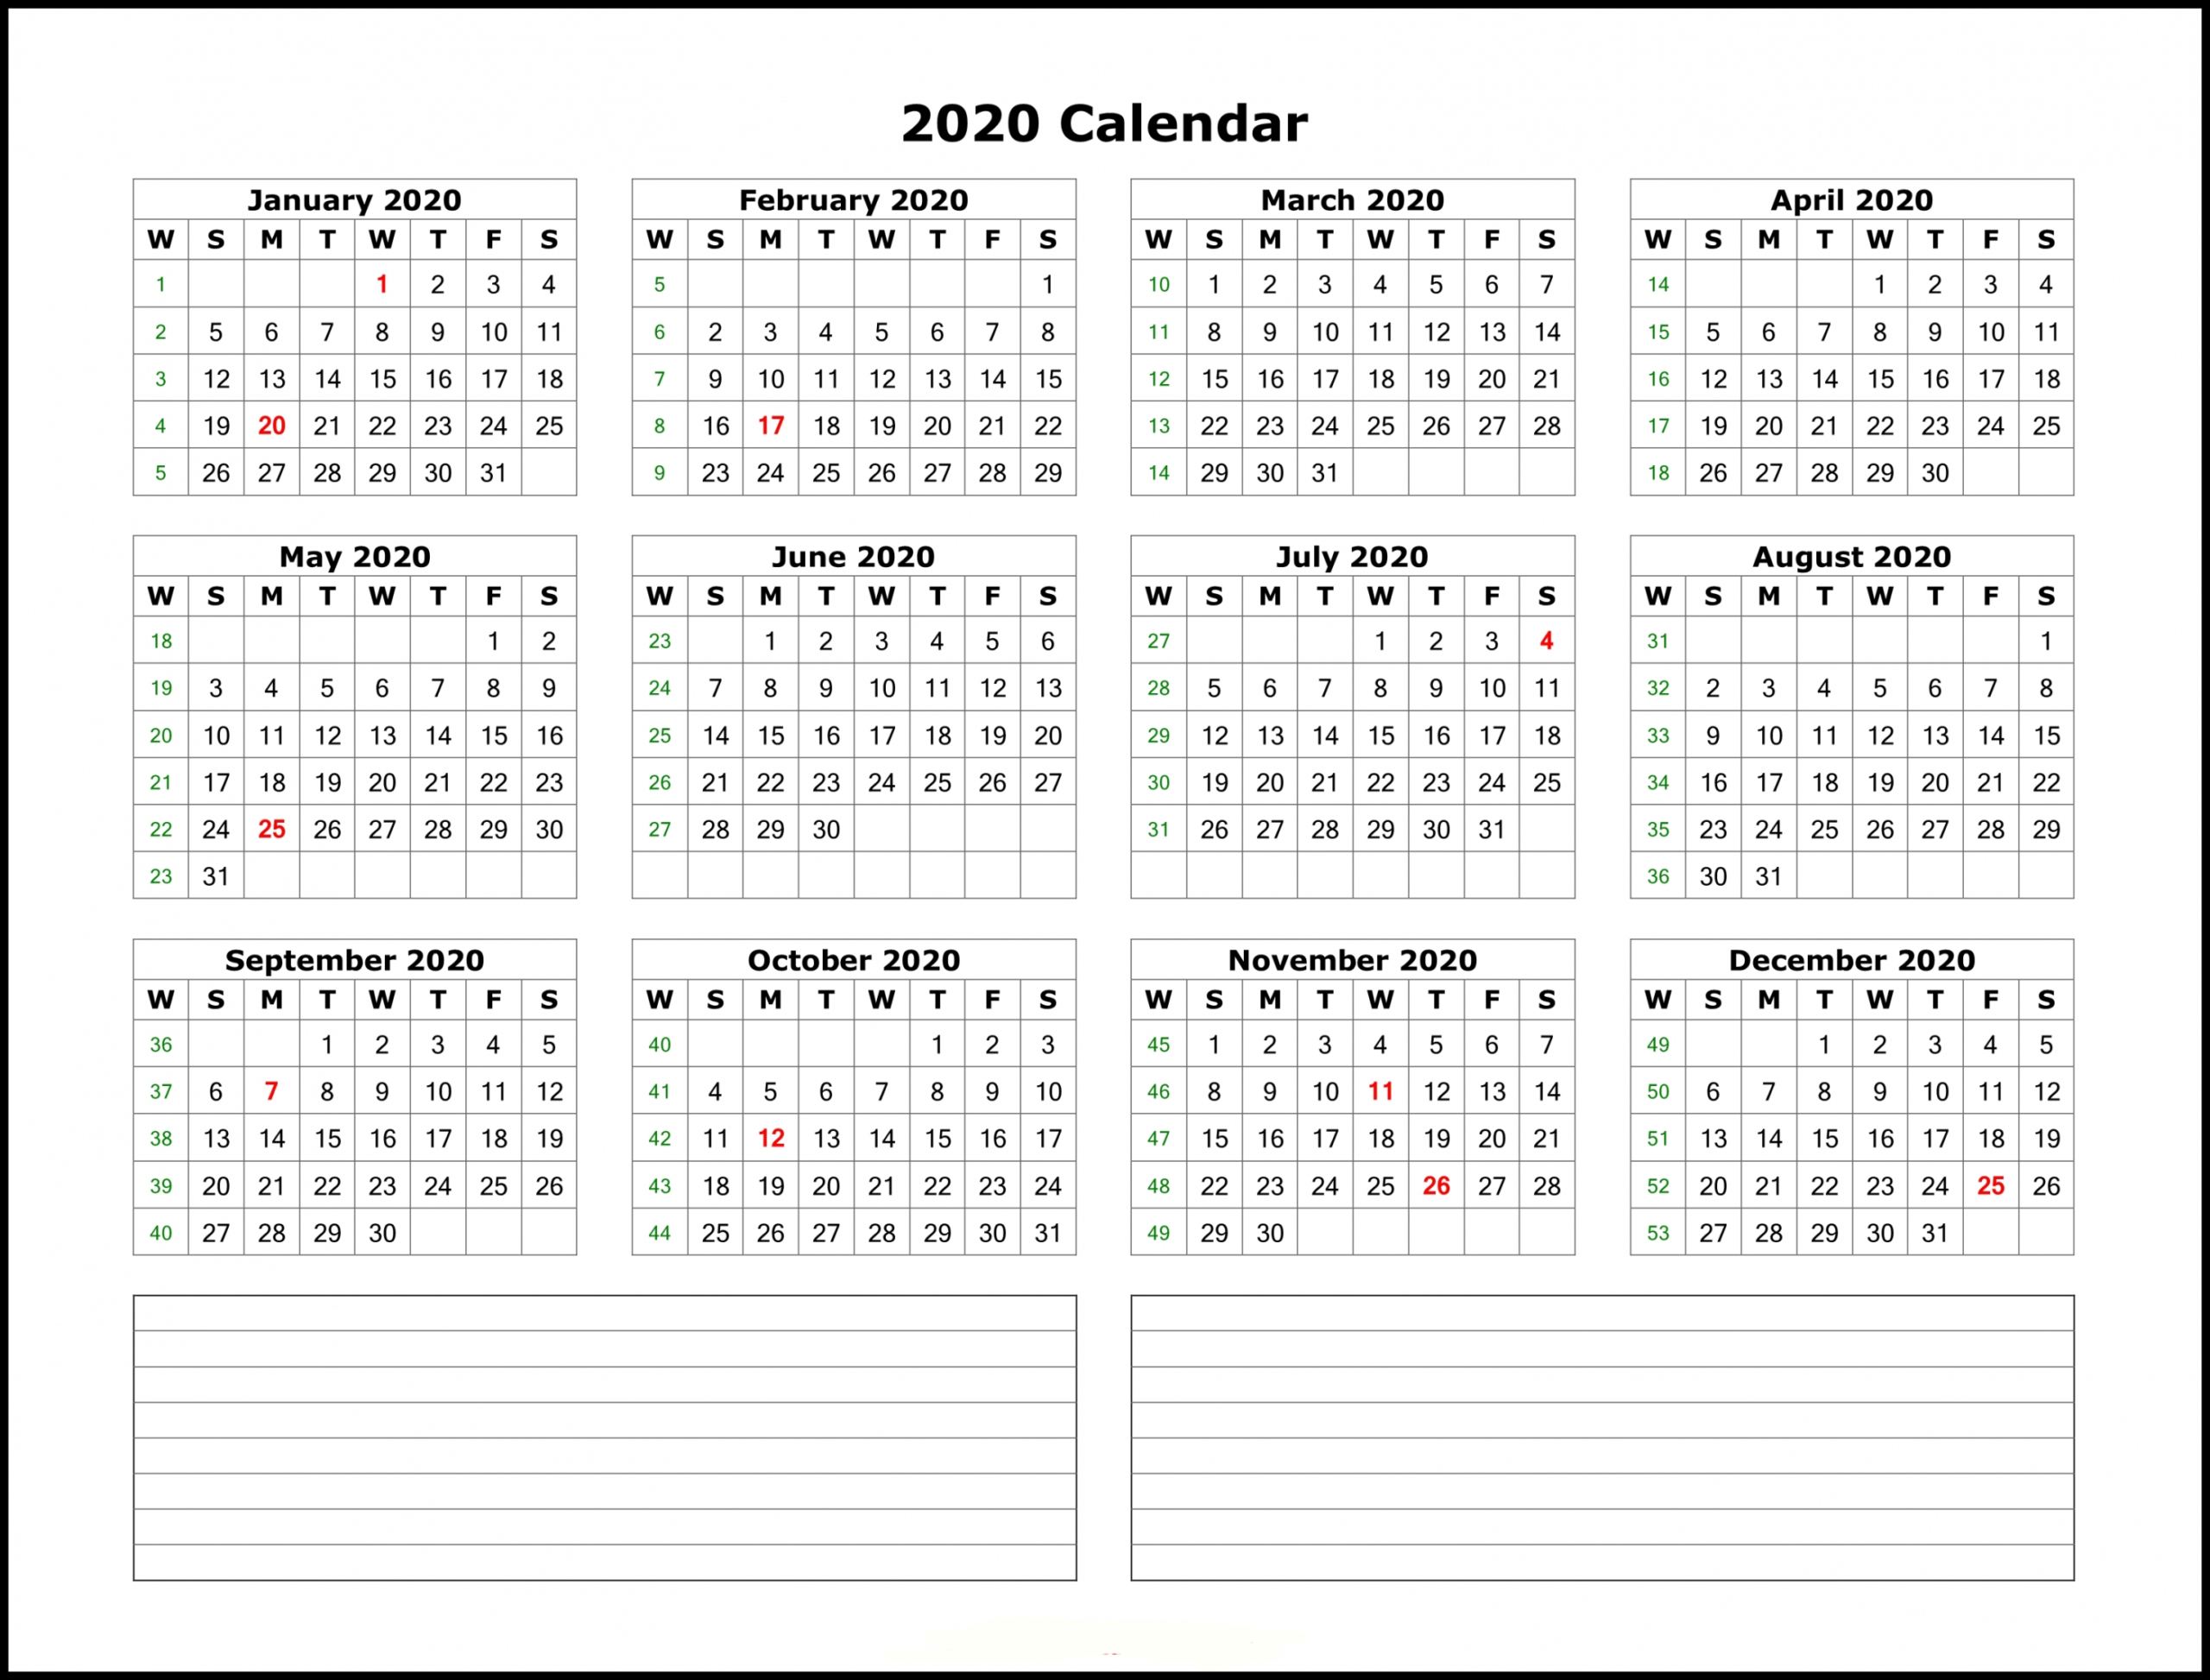 2020 Year Calendar Printable - 2020(이미지 포함) | 달력, 배경화면, 패턴 Free Printable 5 Year Calendar